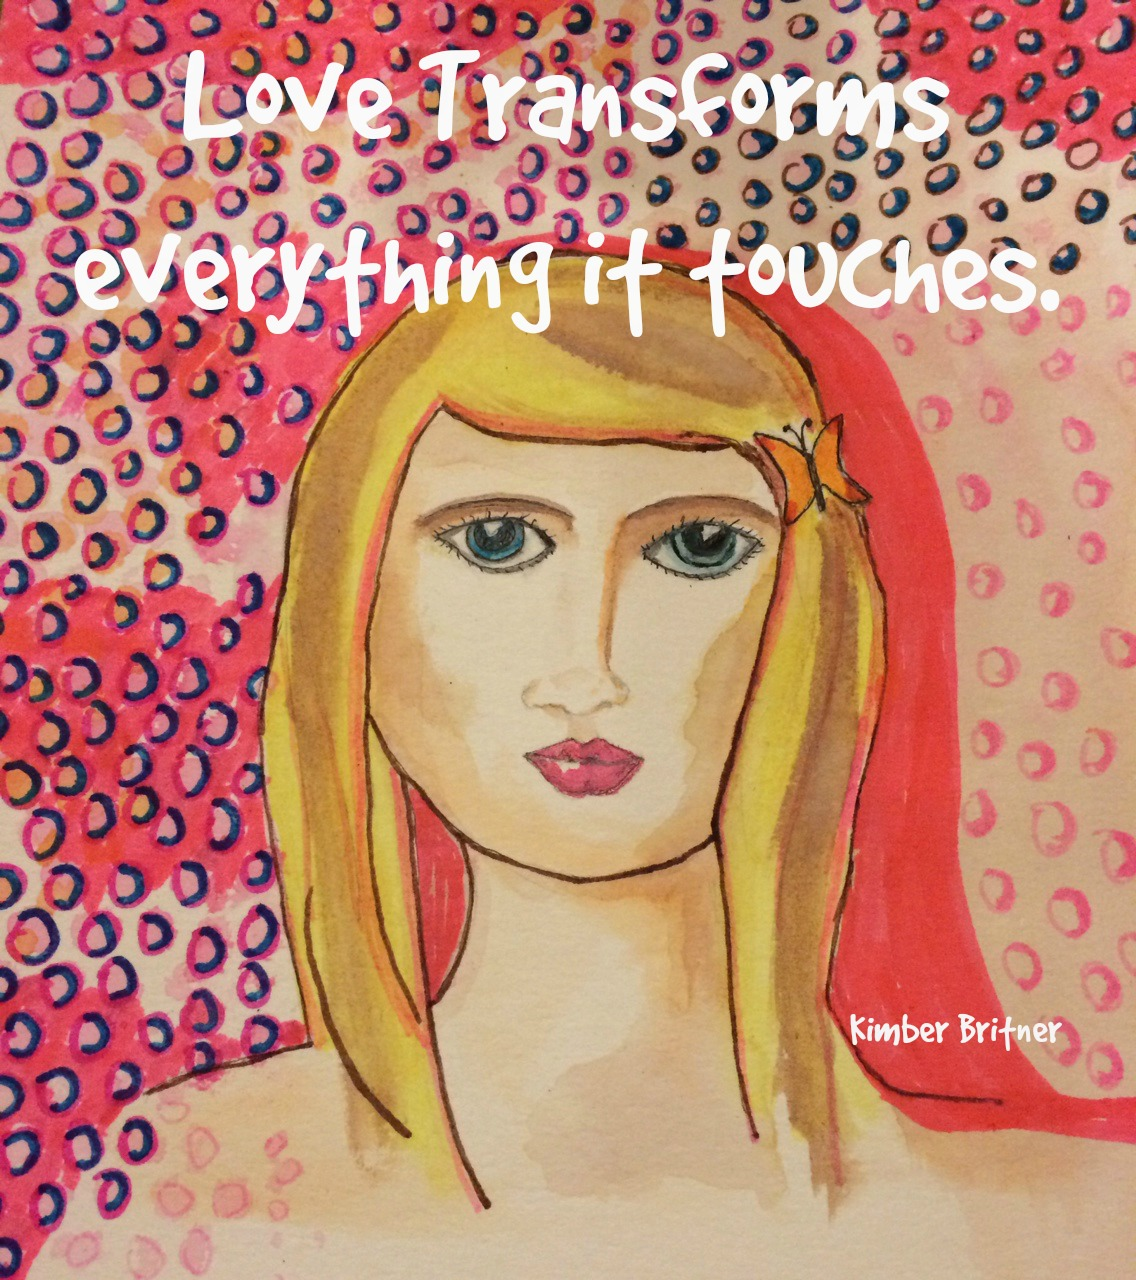 Love transforms